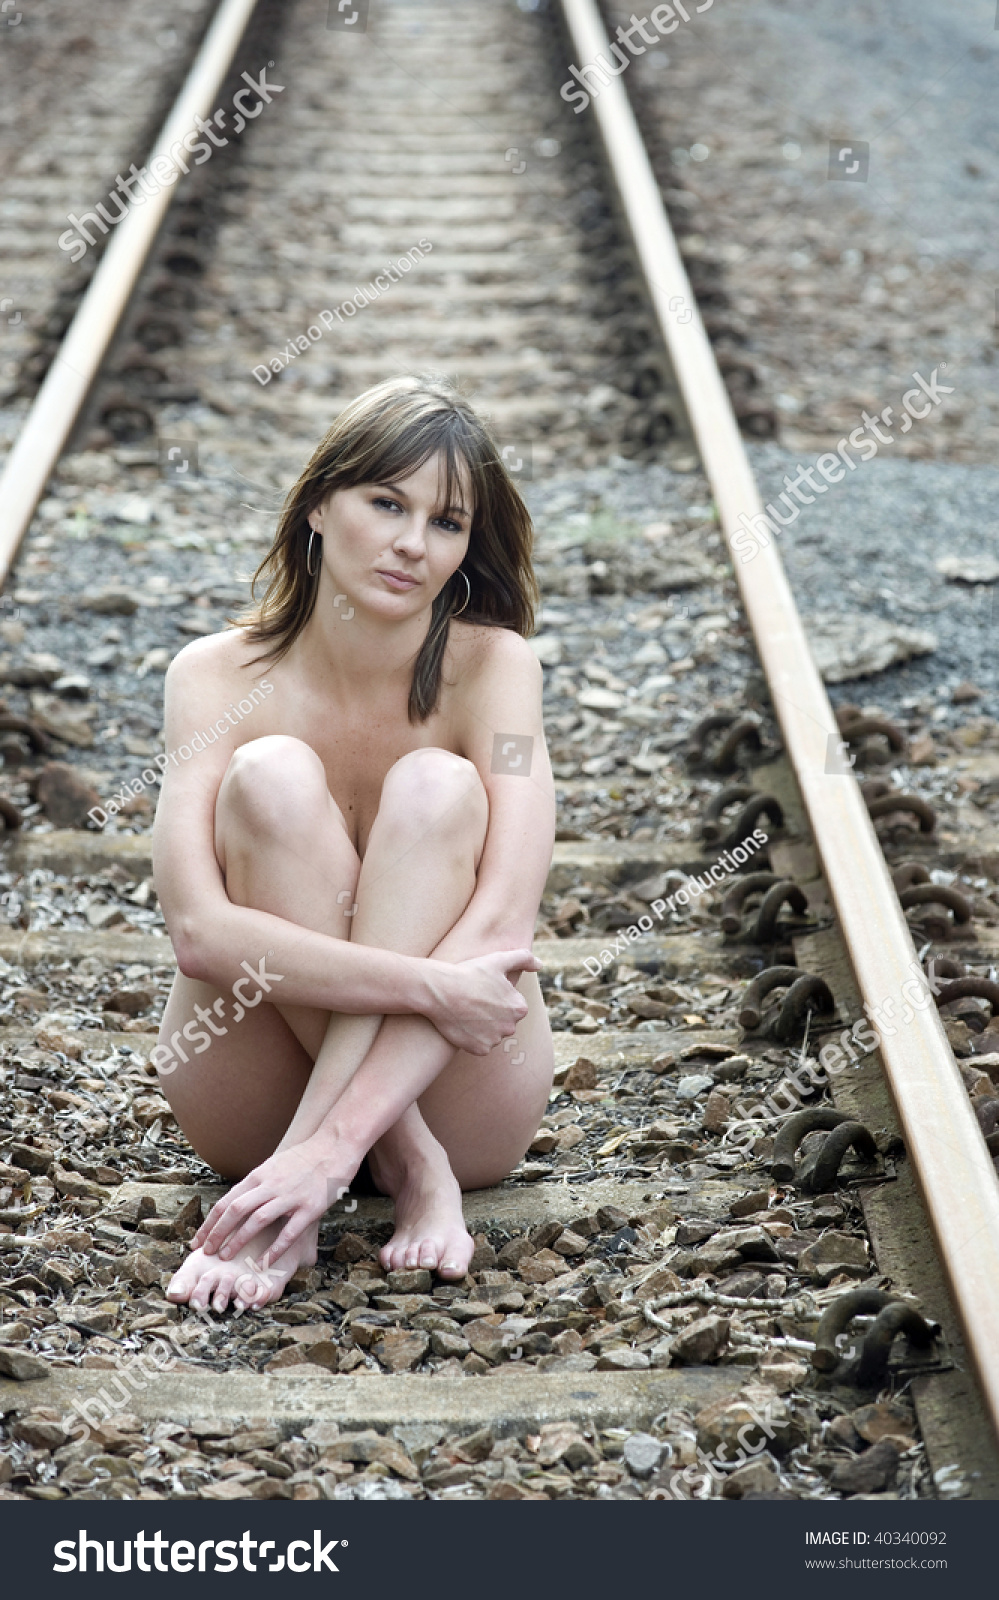 girl avatar the last airbender sex videos